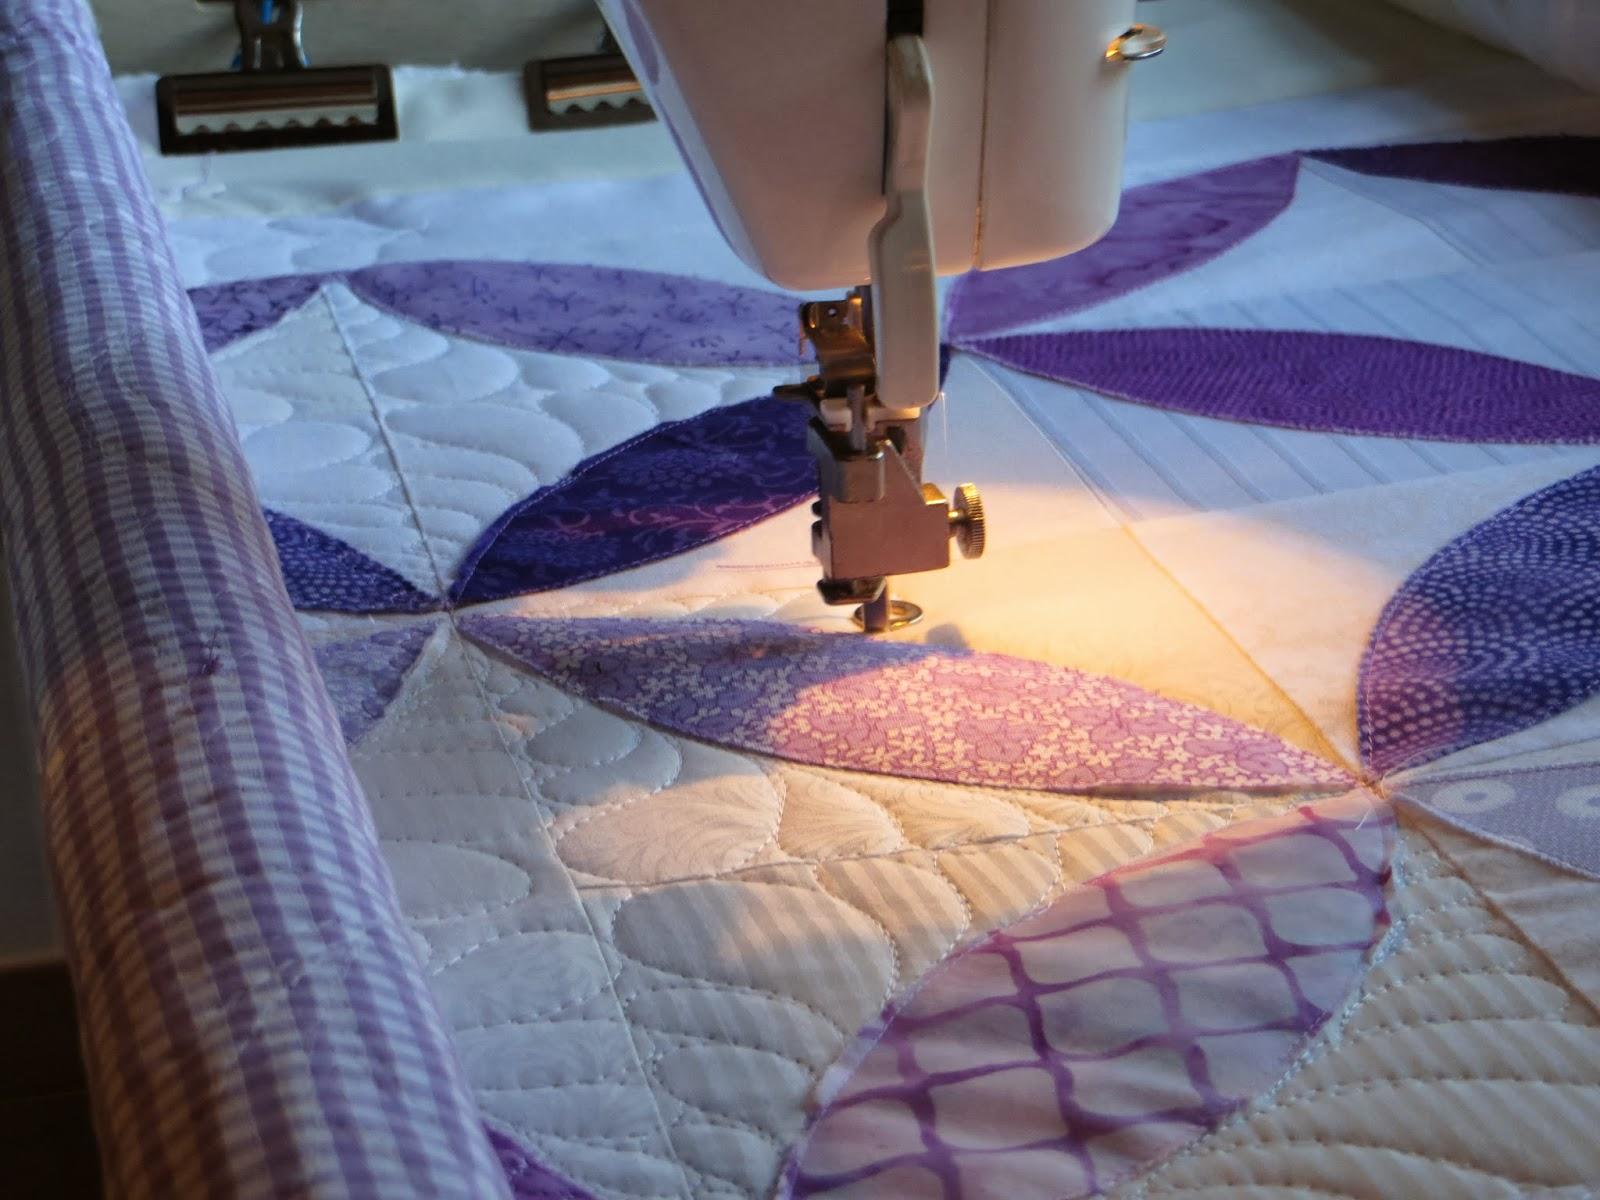 Knitting Speed Stitches Per Minute : machinequilter: Stitches per minute